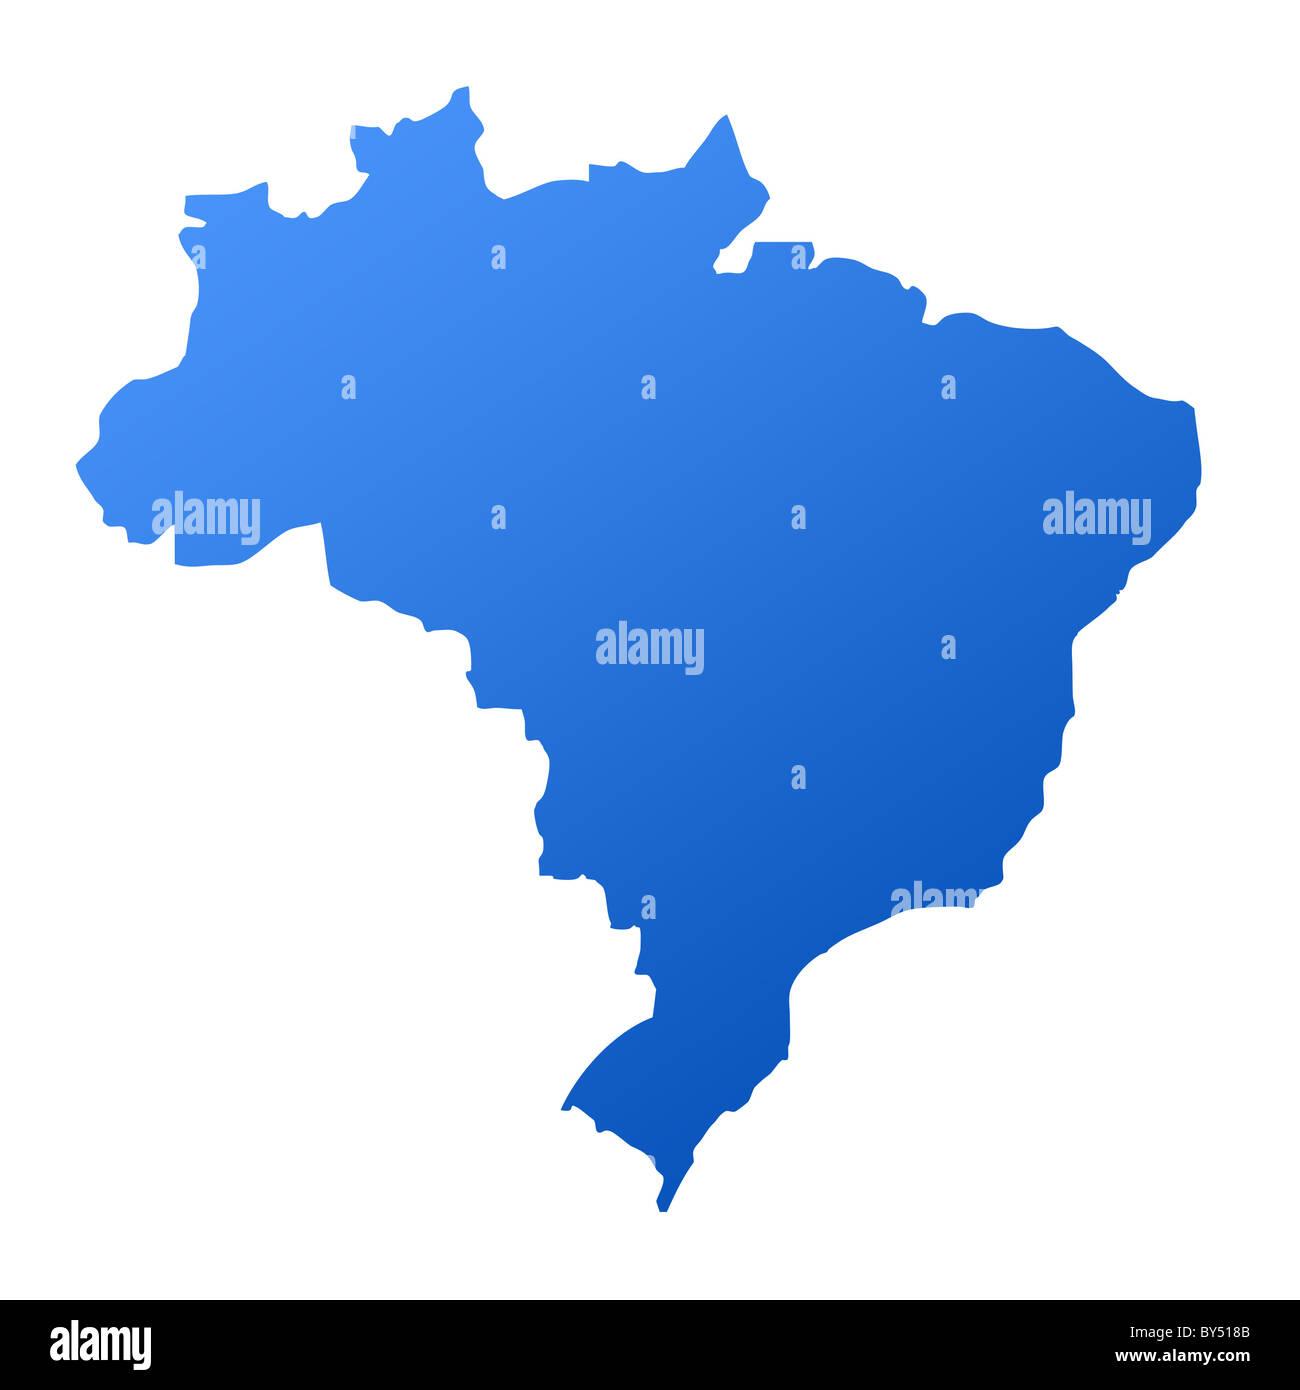 Map Brazil Stock Photos & Map Brazil Stock Images - Alamy